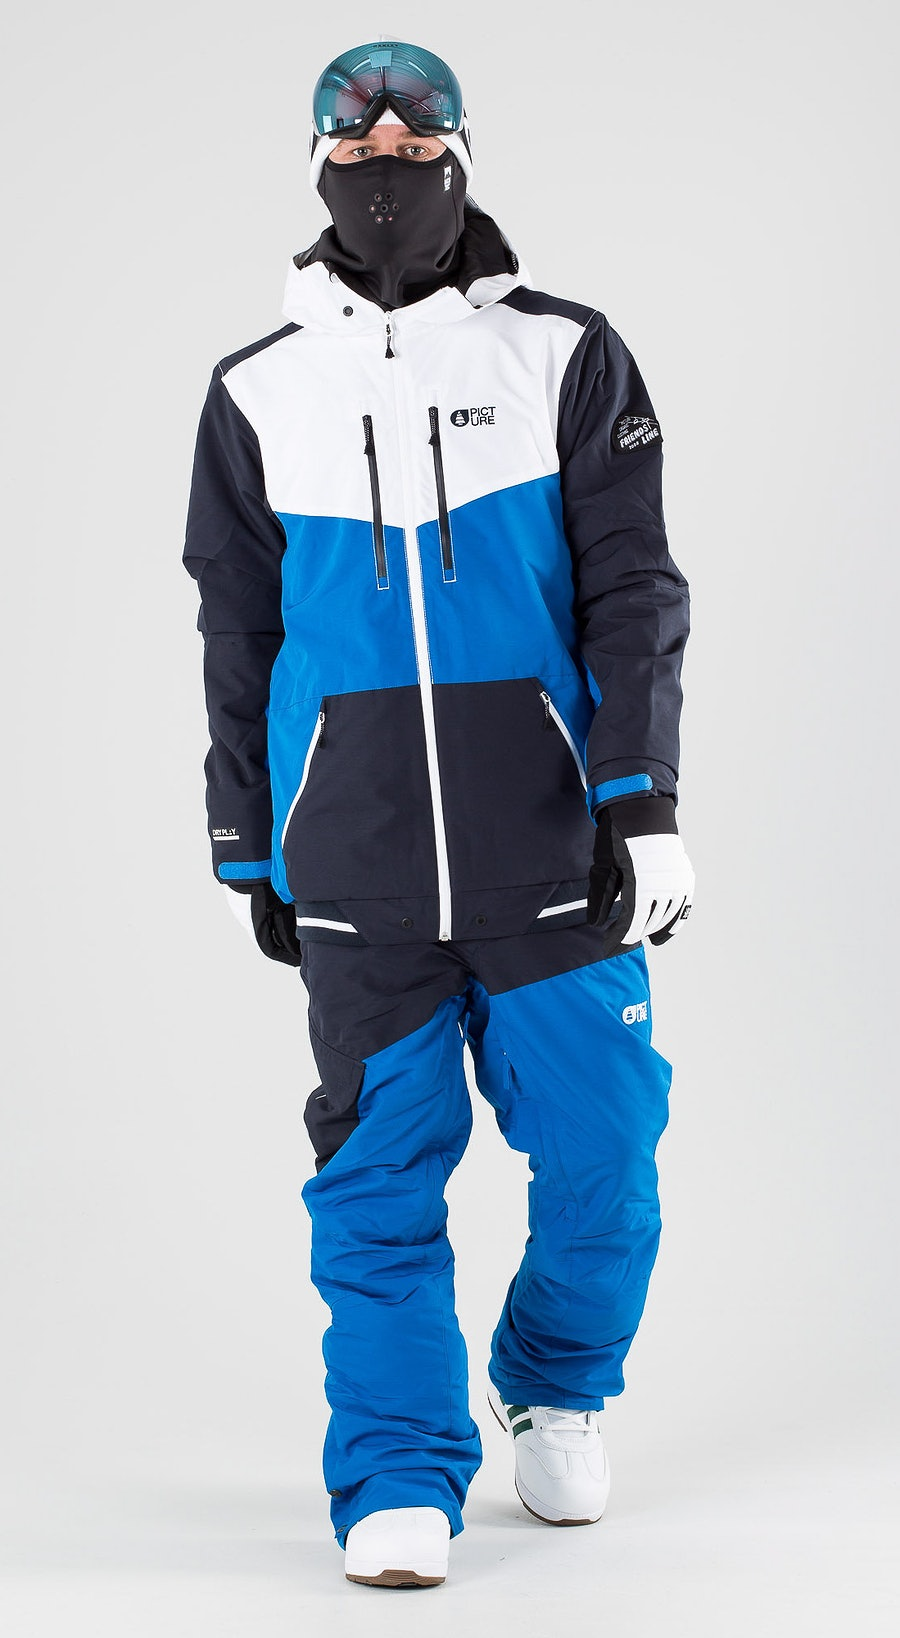 Picture Panel Blue Snowboardkläder Multi